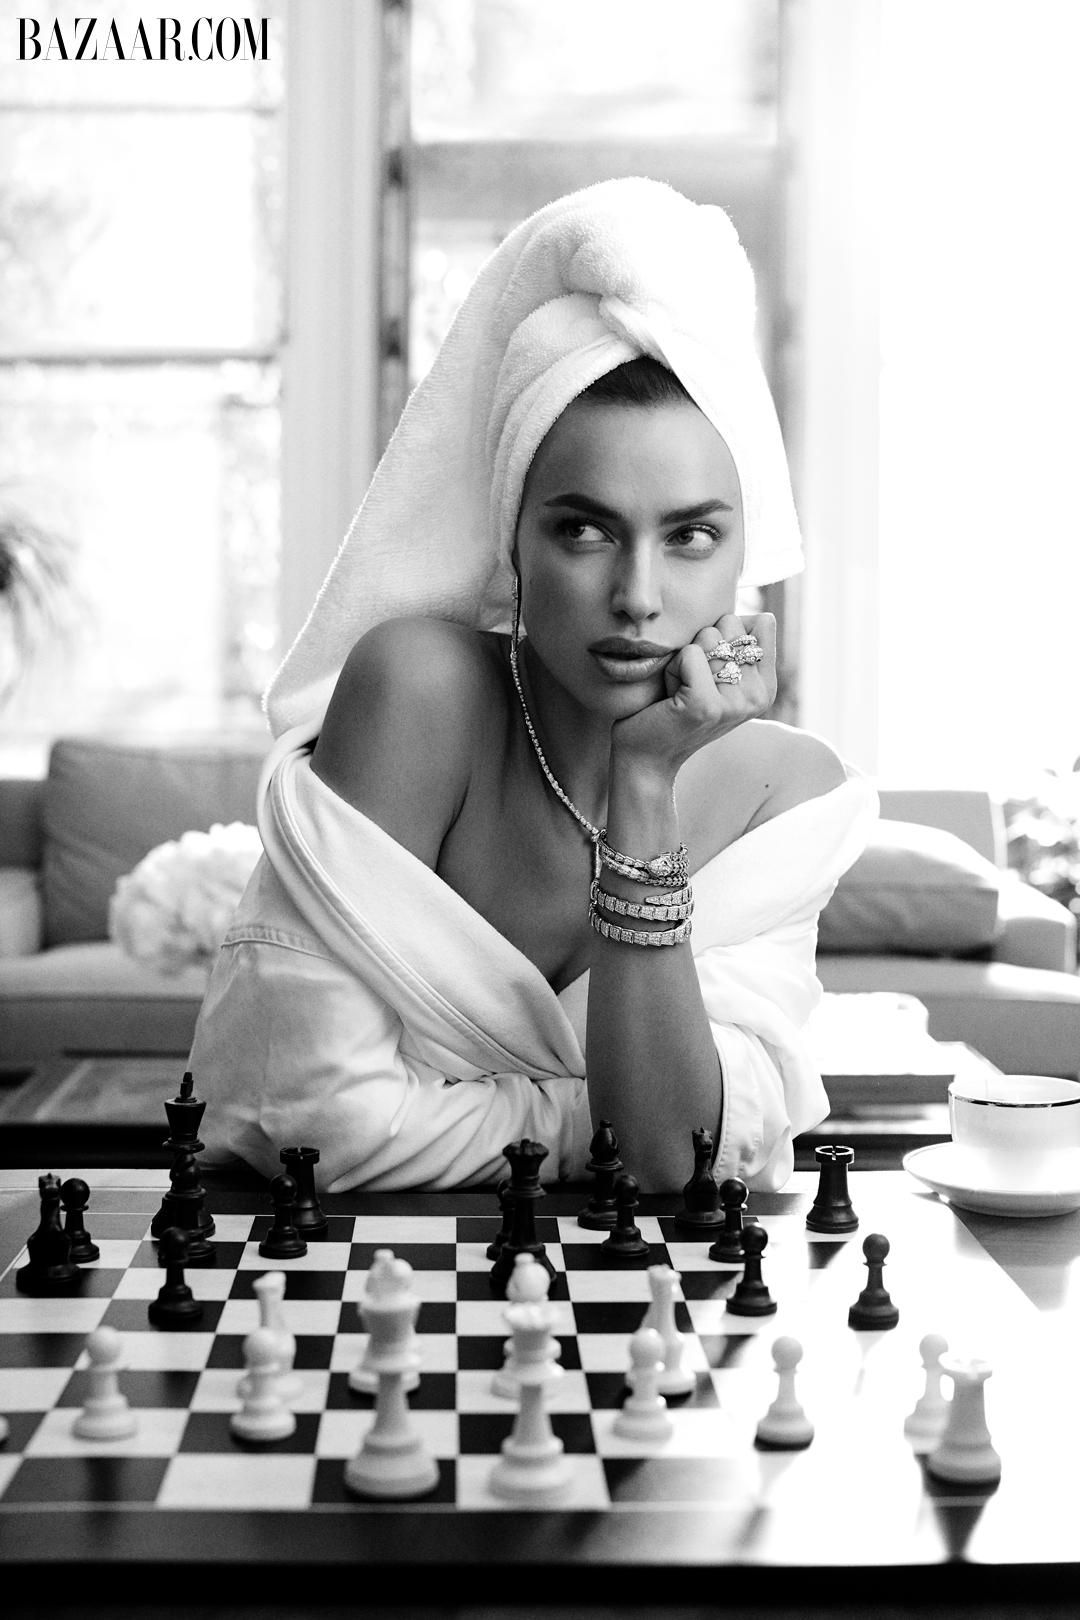 Irina-Shayk-talks-Motherhood-Harpers-Bazaar